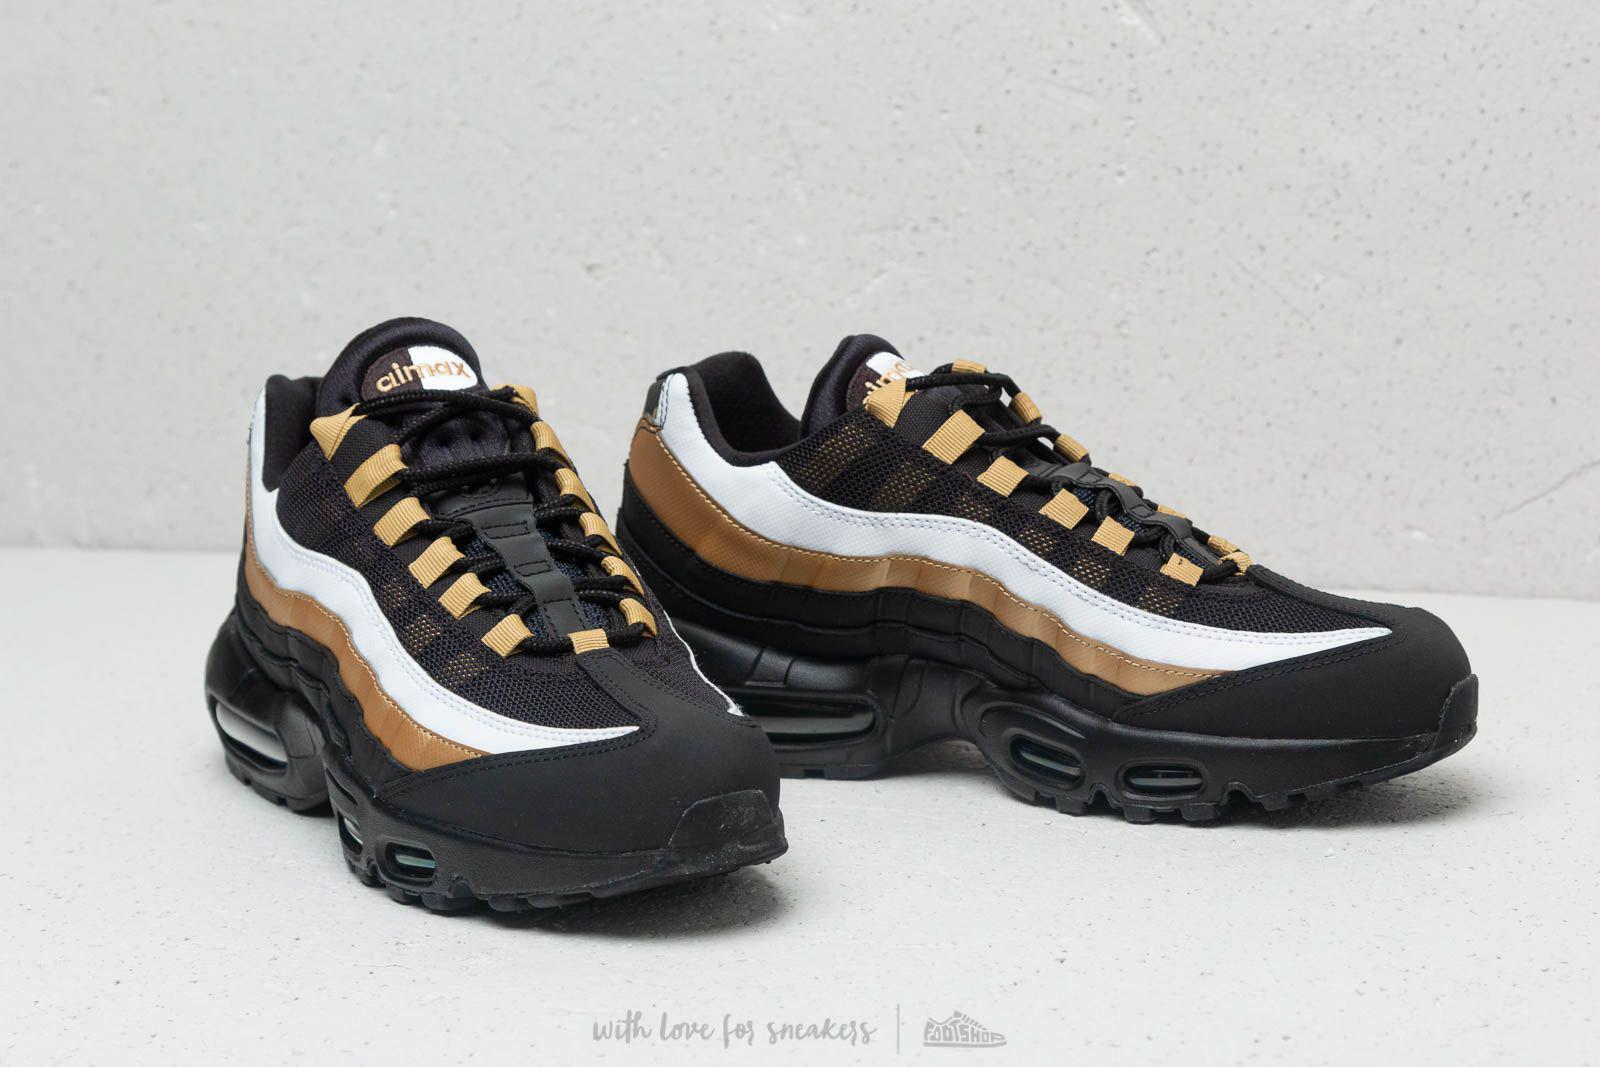 official photos df82b 64d9a Nike Air Max 95 Og Black  Black-metallic Gold in Black for Men - Lyst